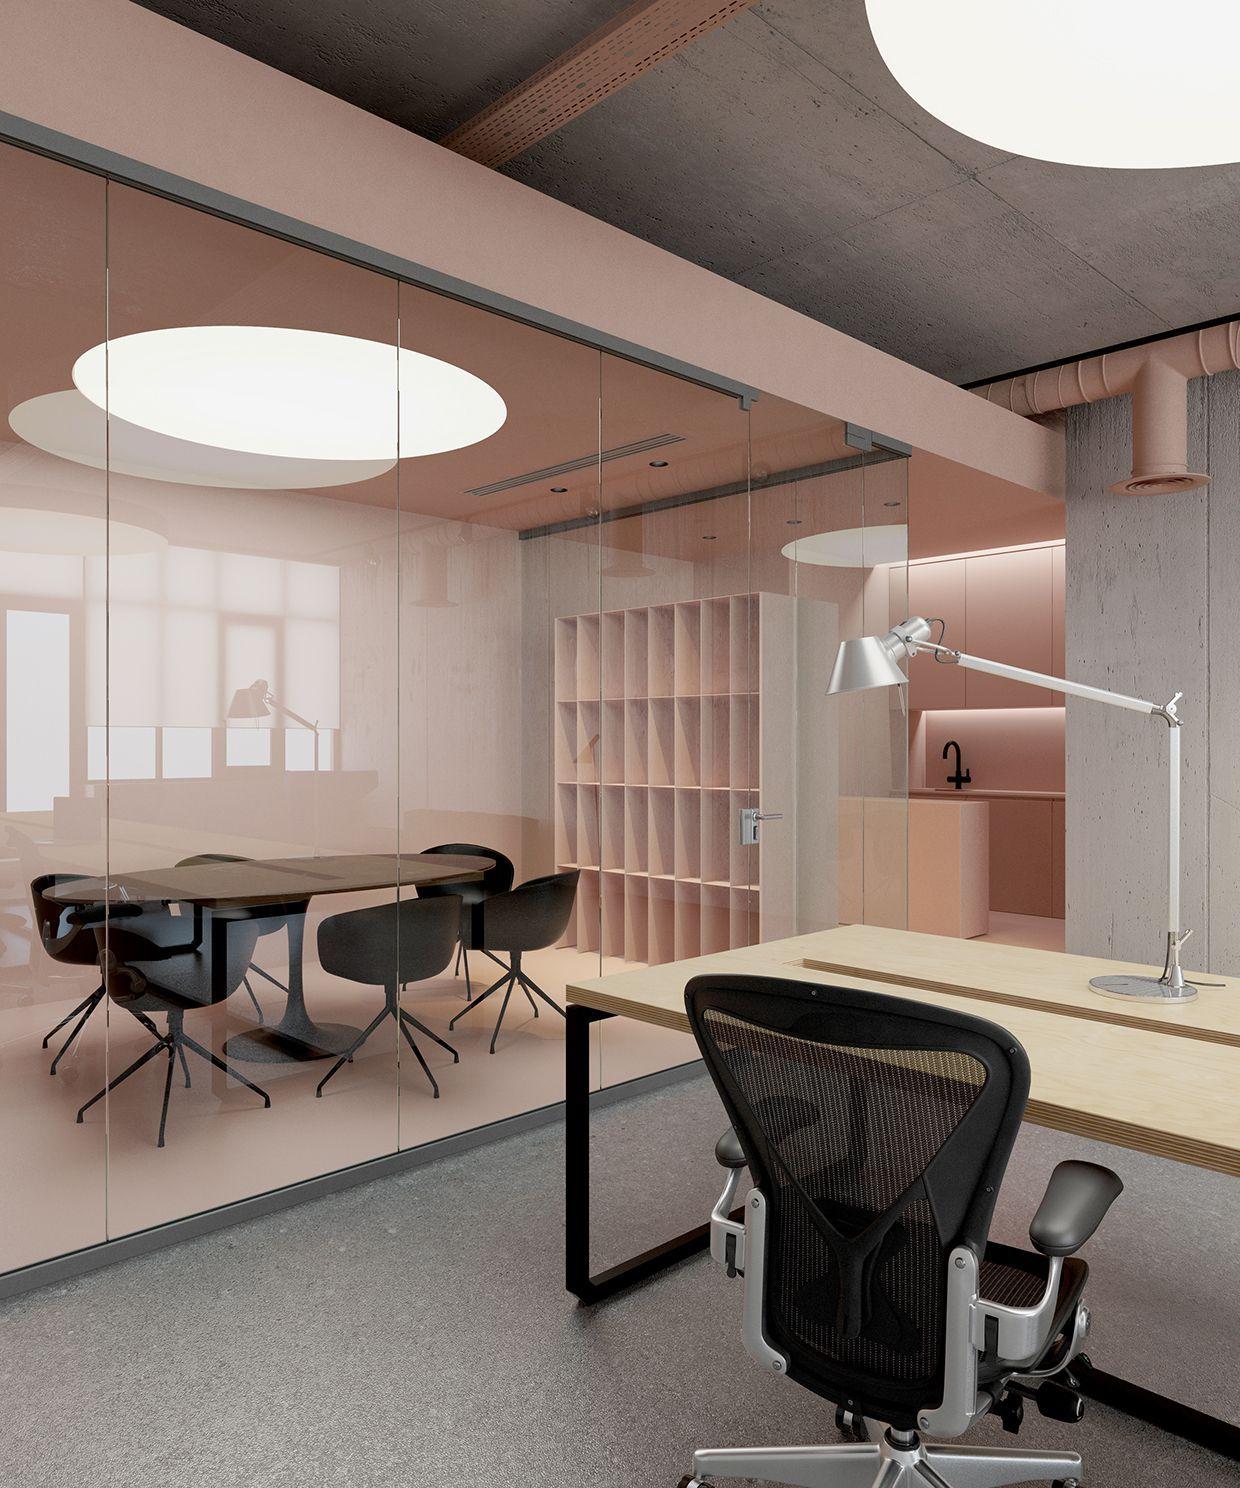 office p inspiring living room interior design corporate office rh pinterest com